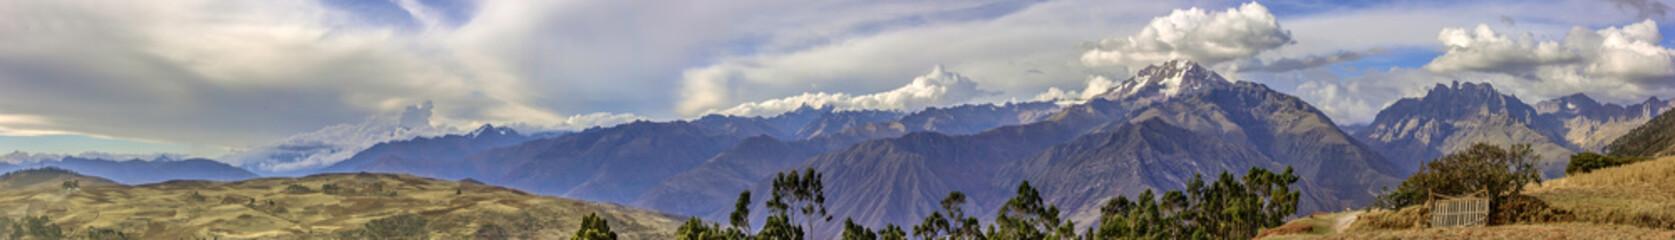 High Andes Near Cuzco